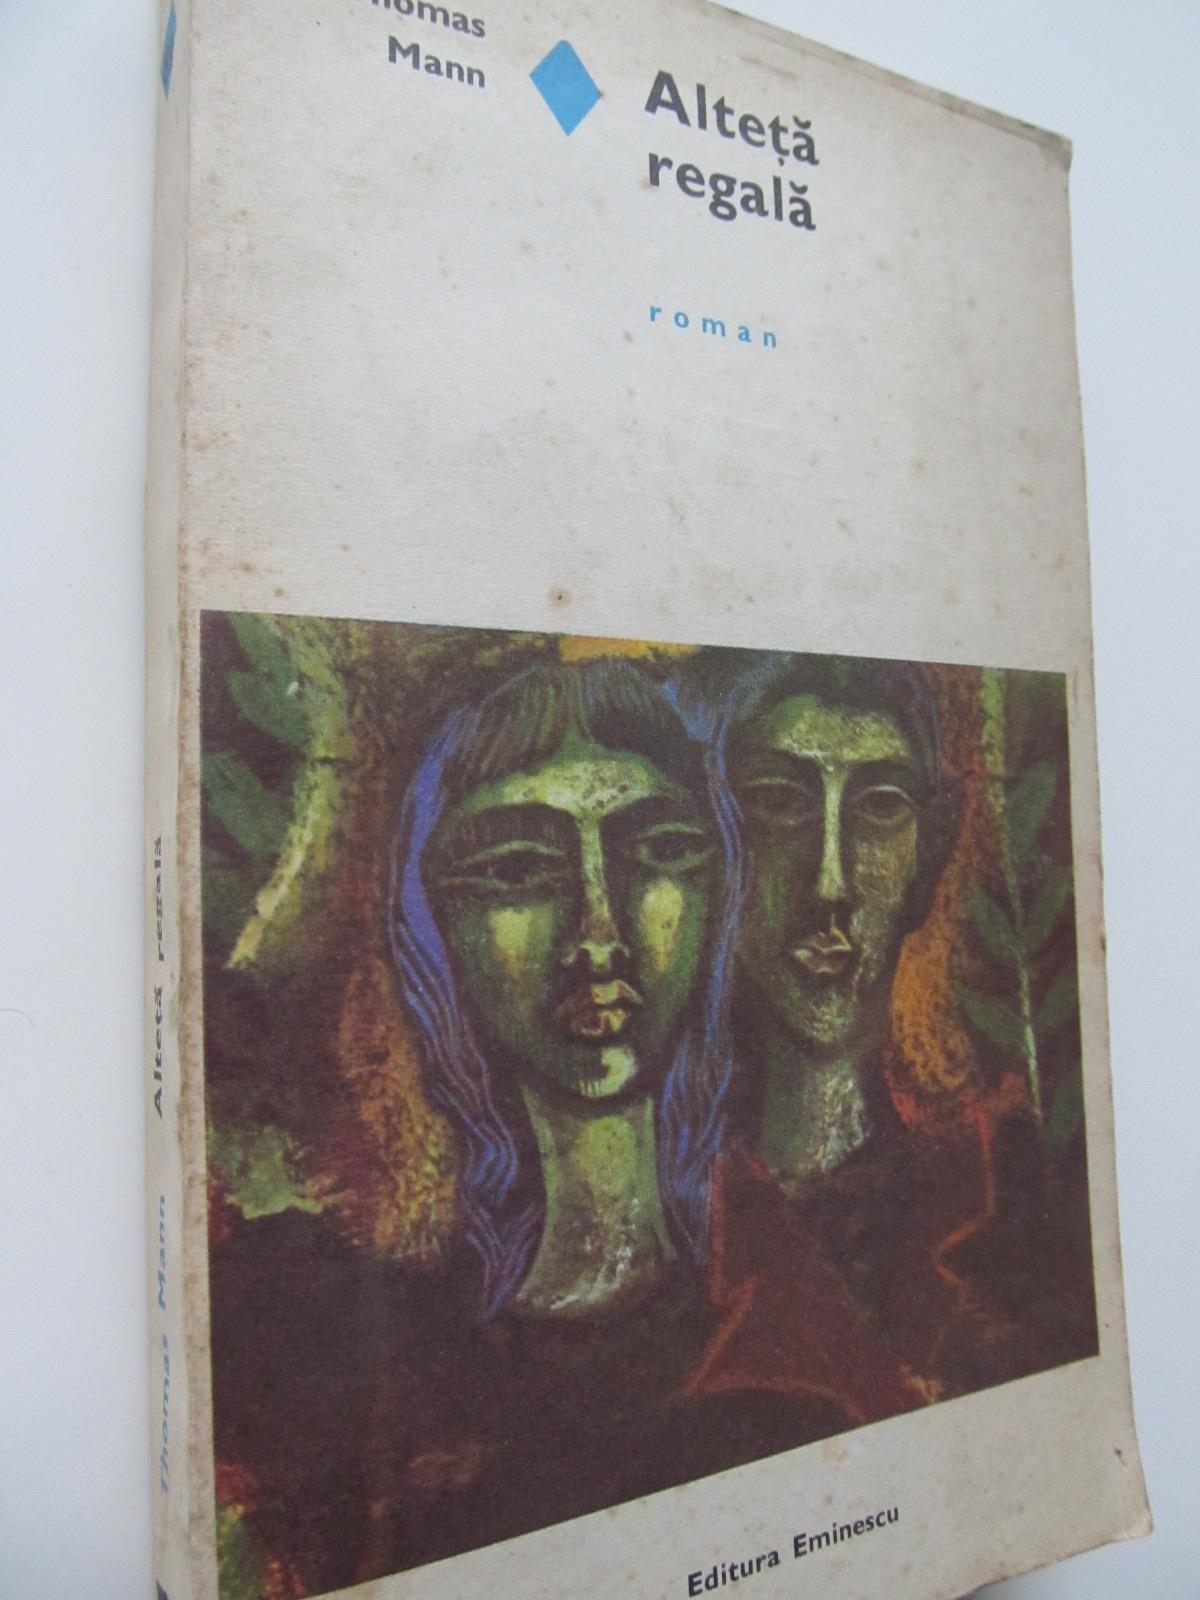 Alteta regala - Thomas Mann | Detalii carte